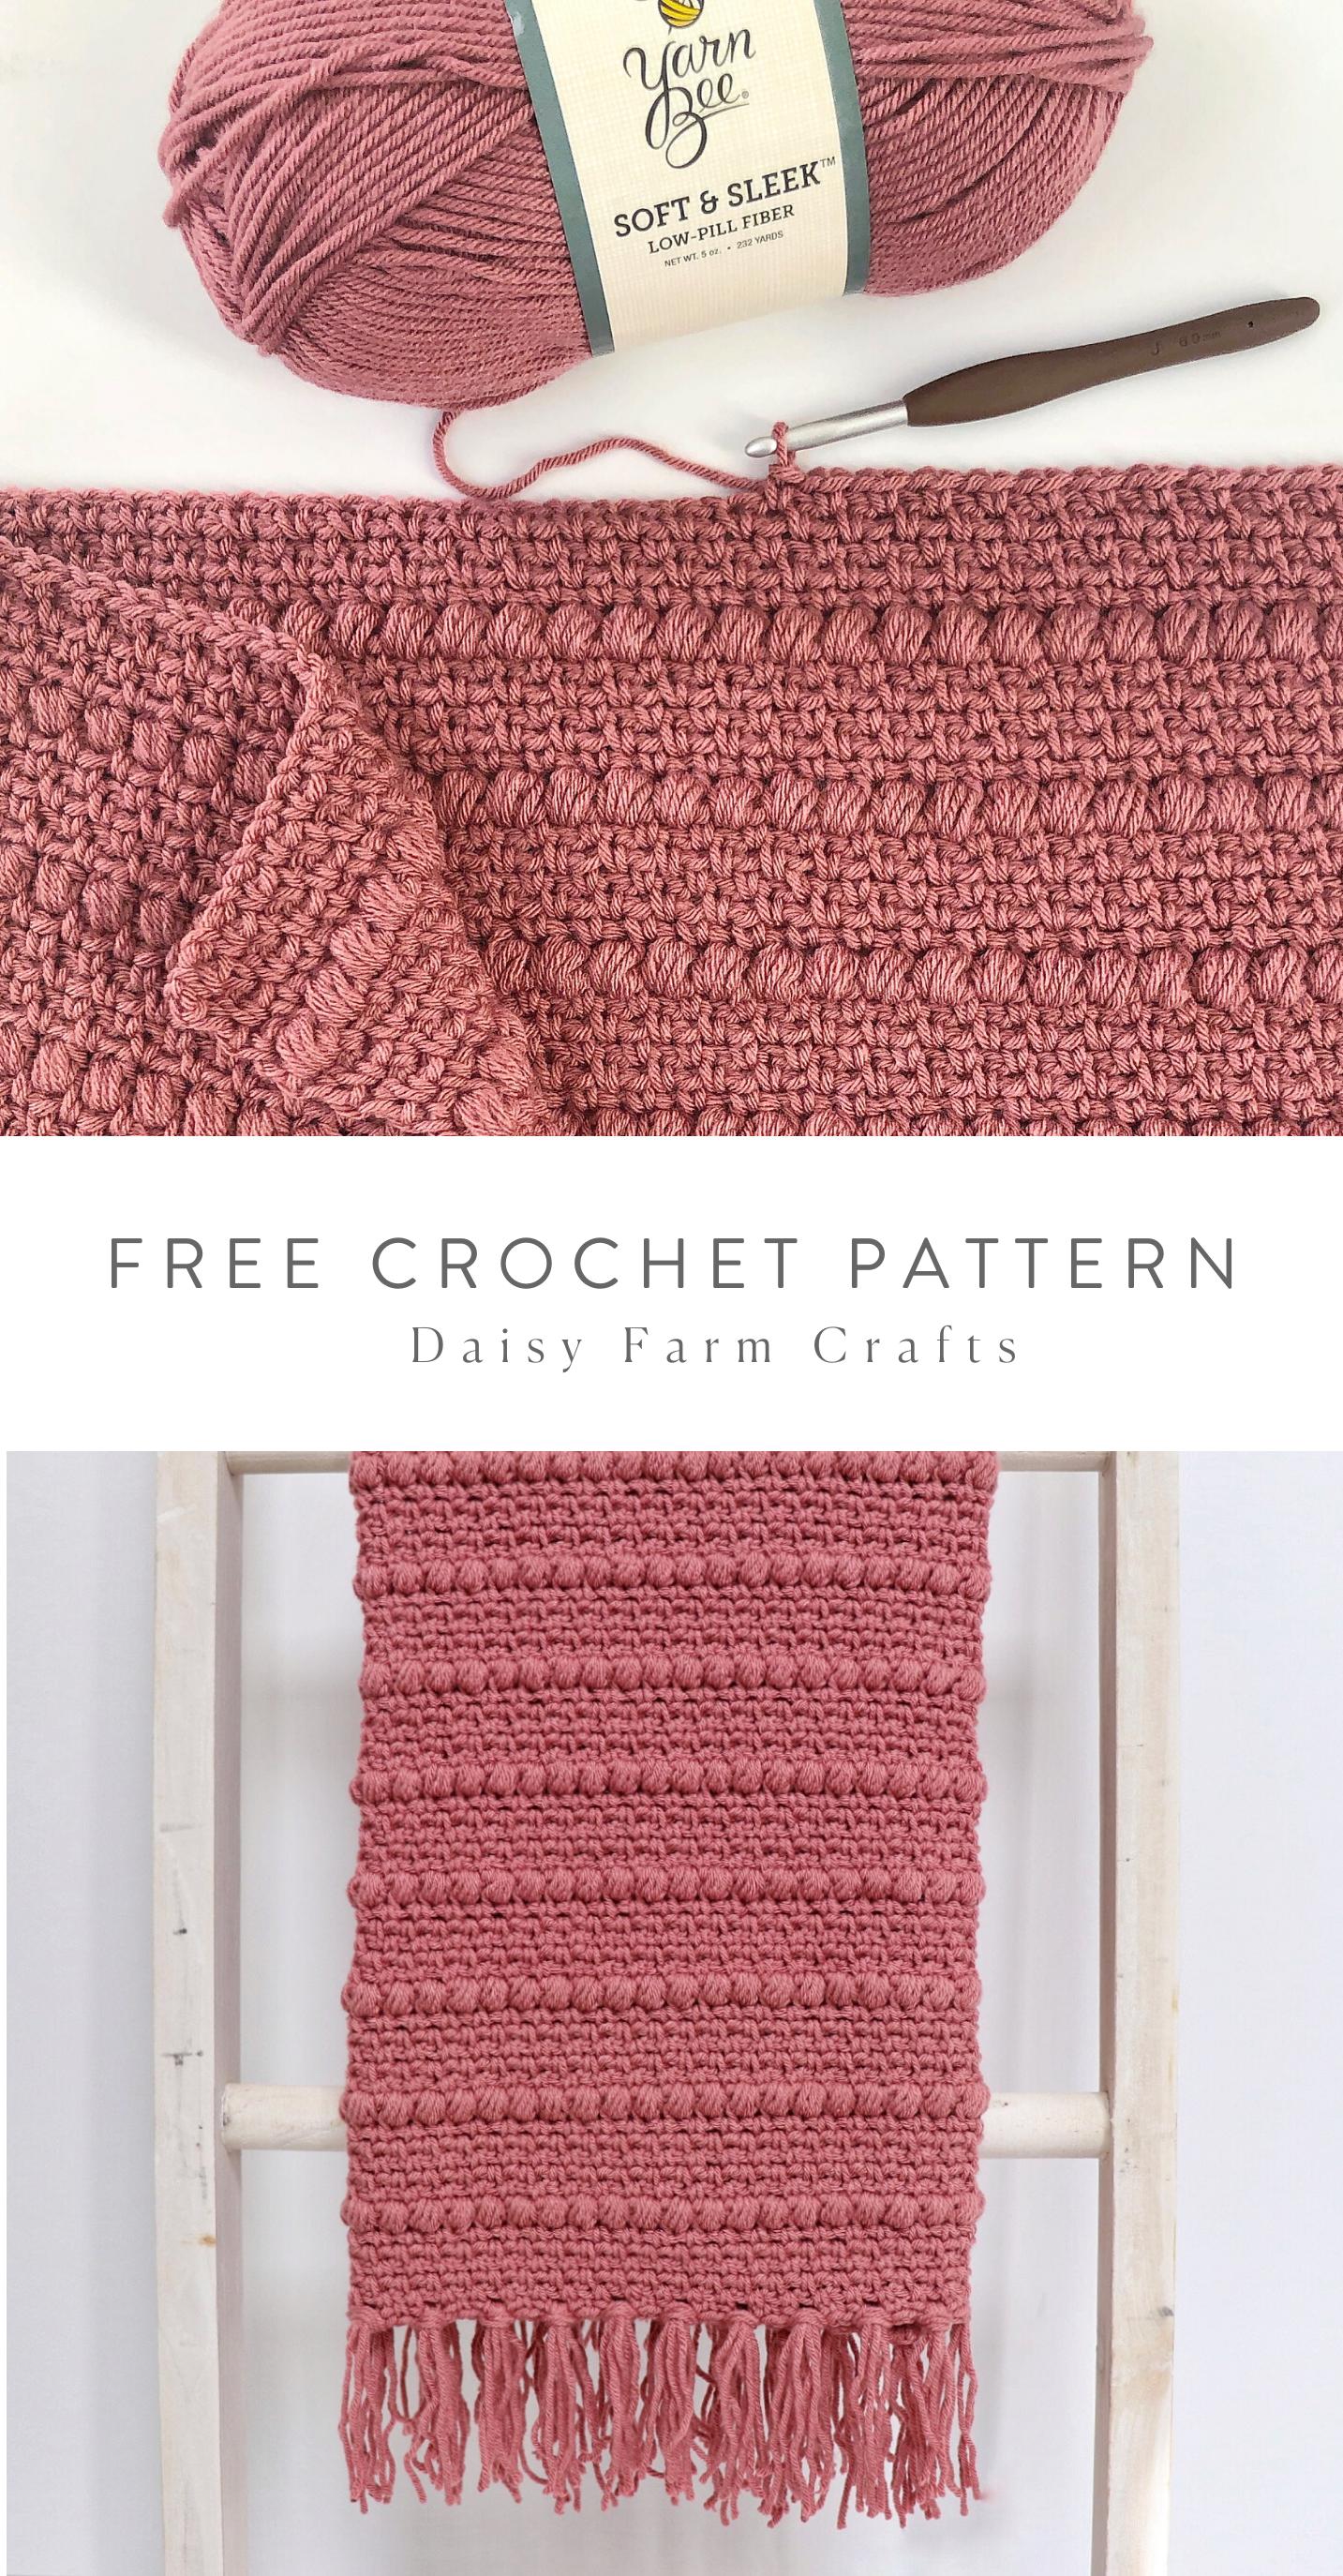 Free Pattern  Crochet Boho Puff Stripes Blanket